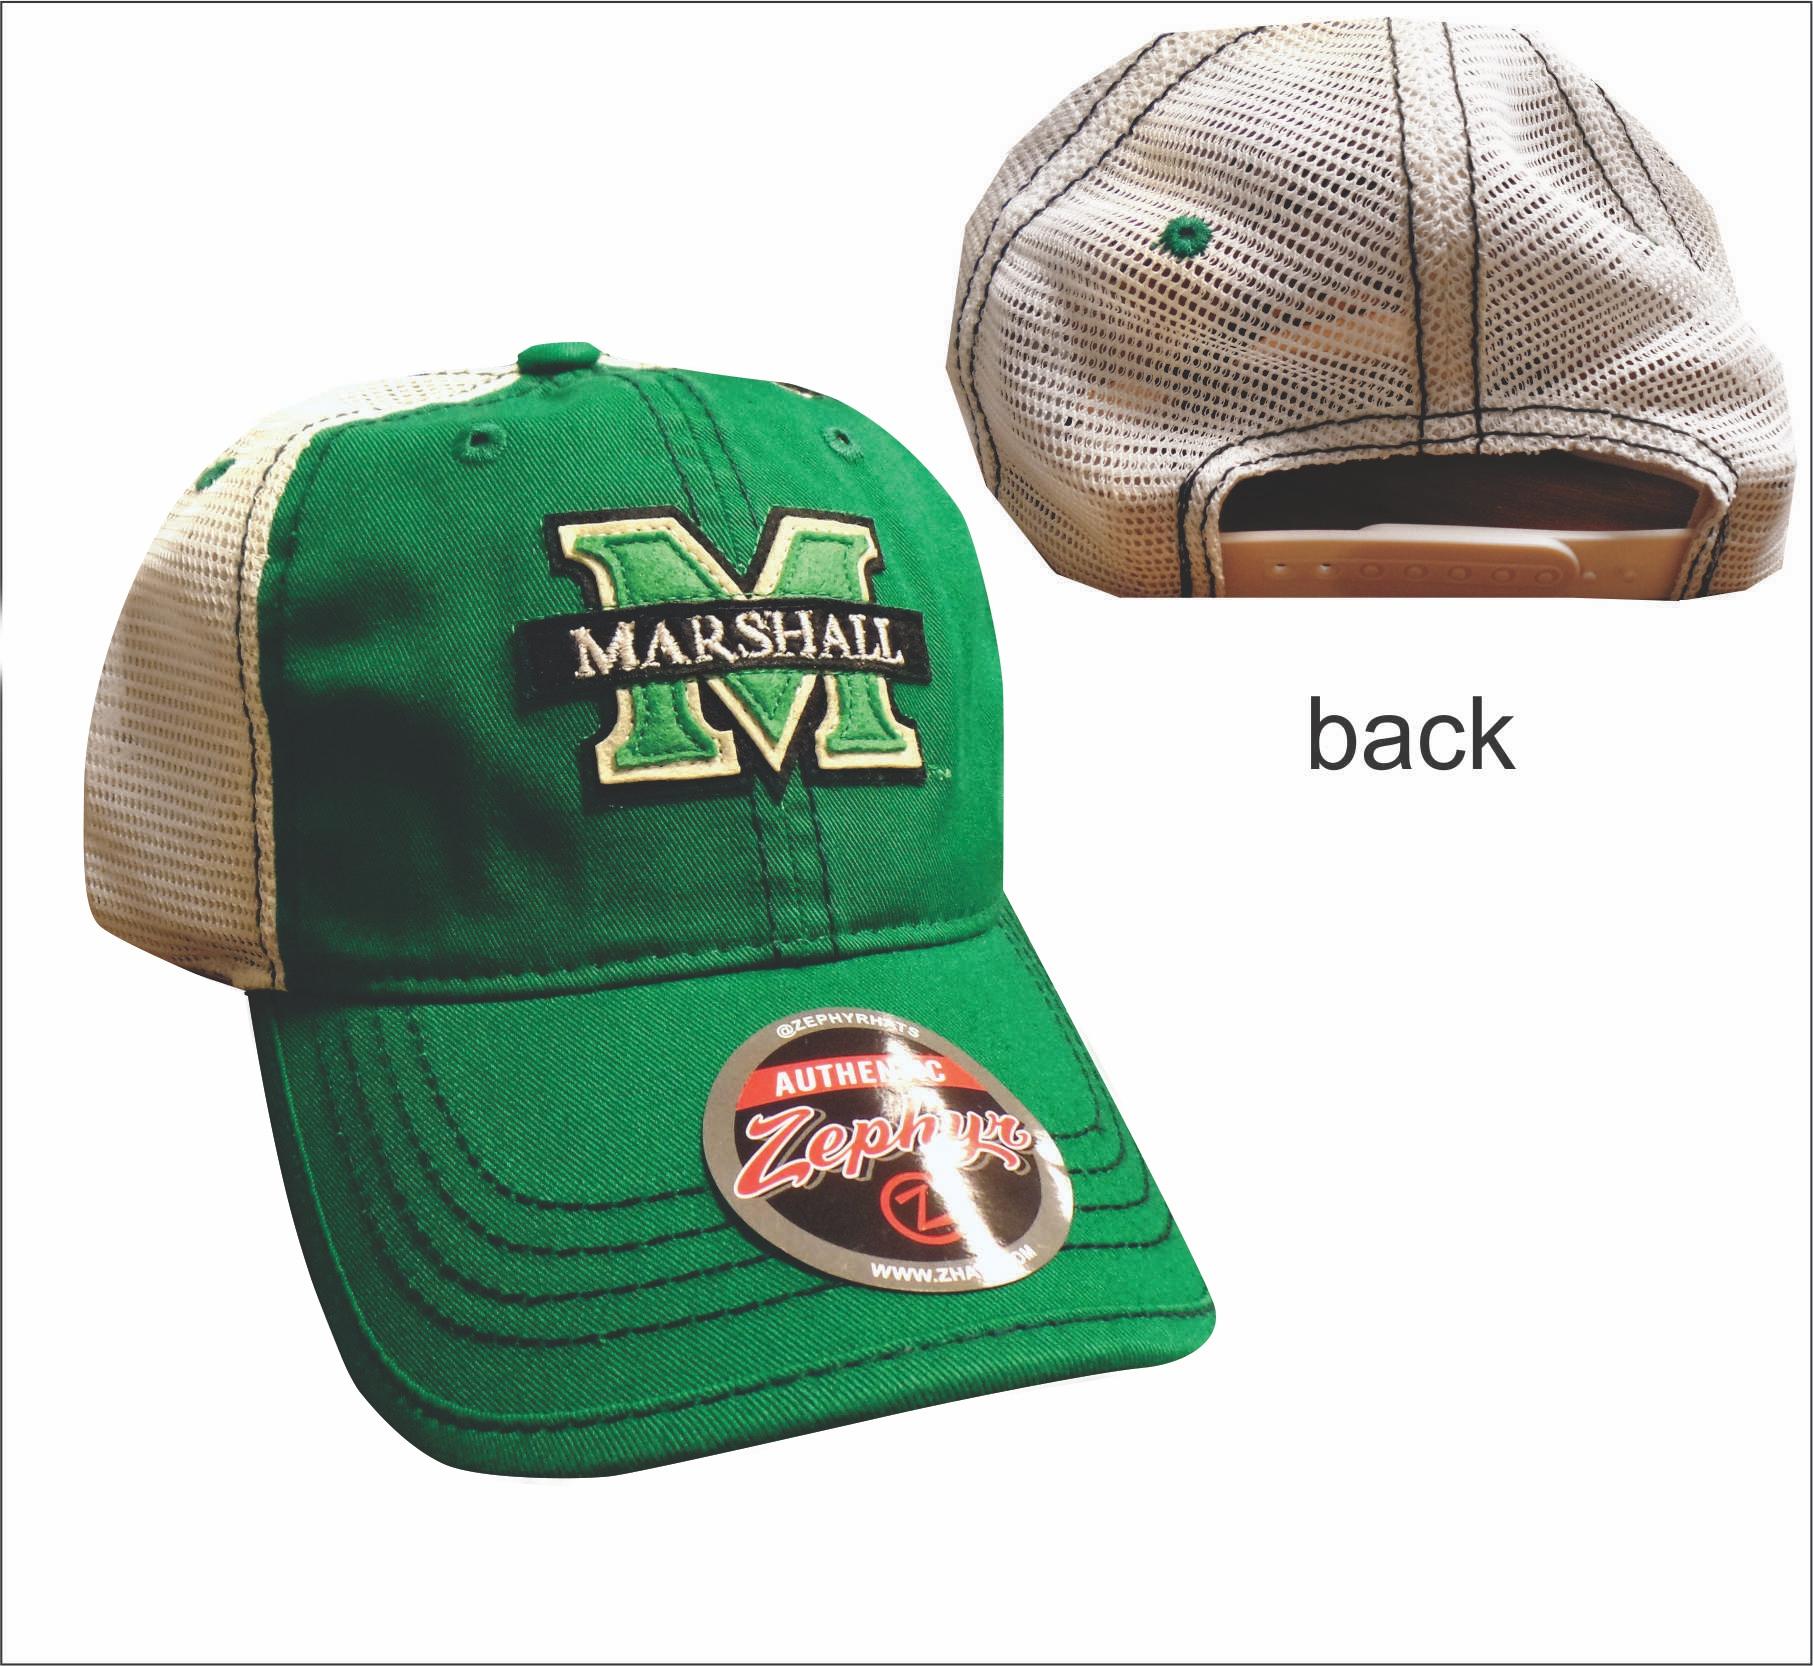 27060 <Br>MU UNIVERSITY CAP <BR>$19.99